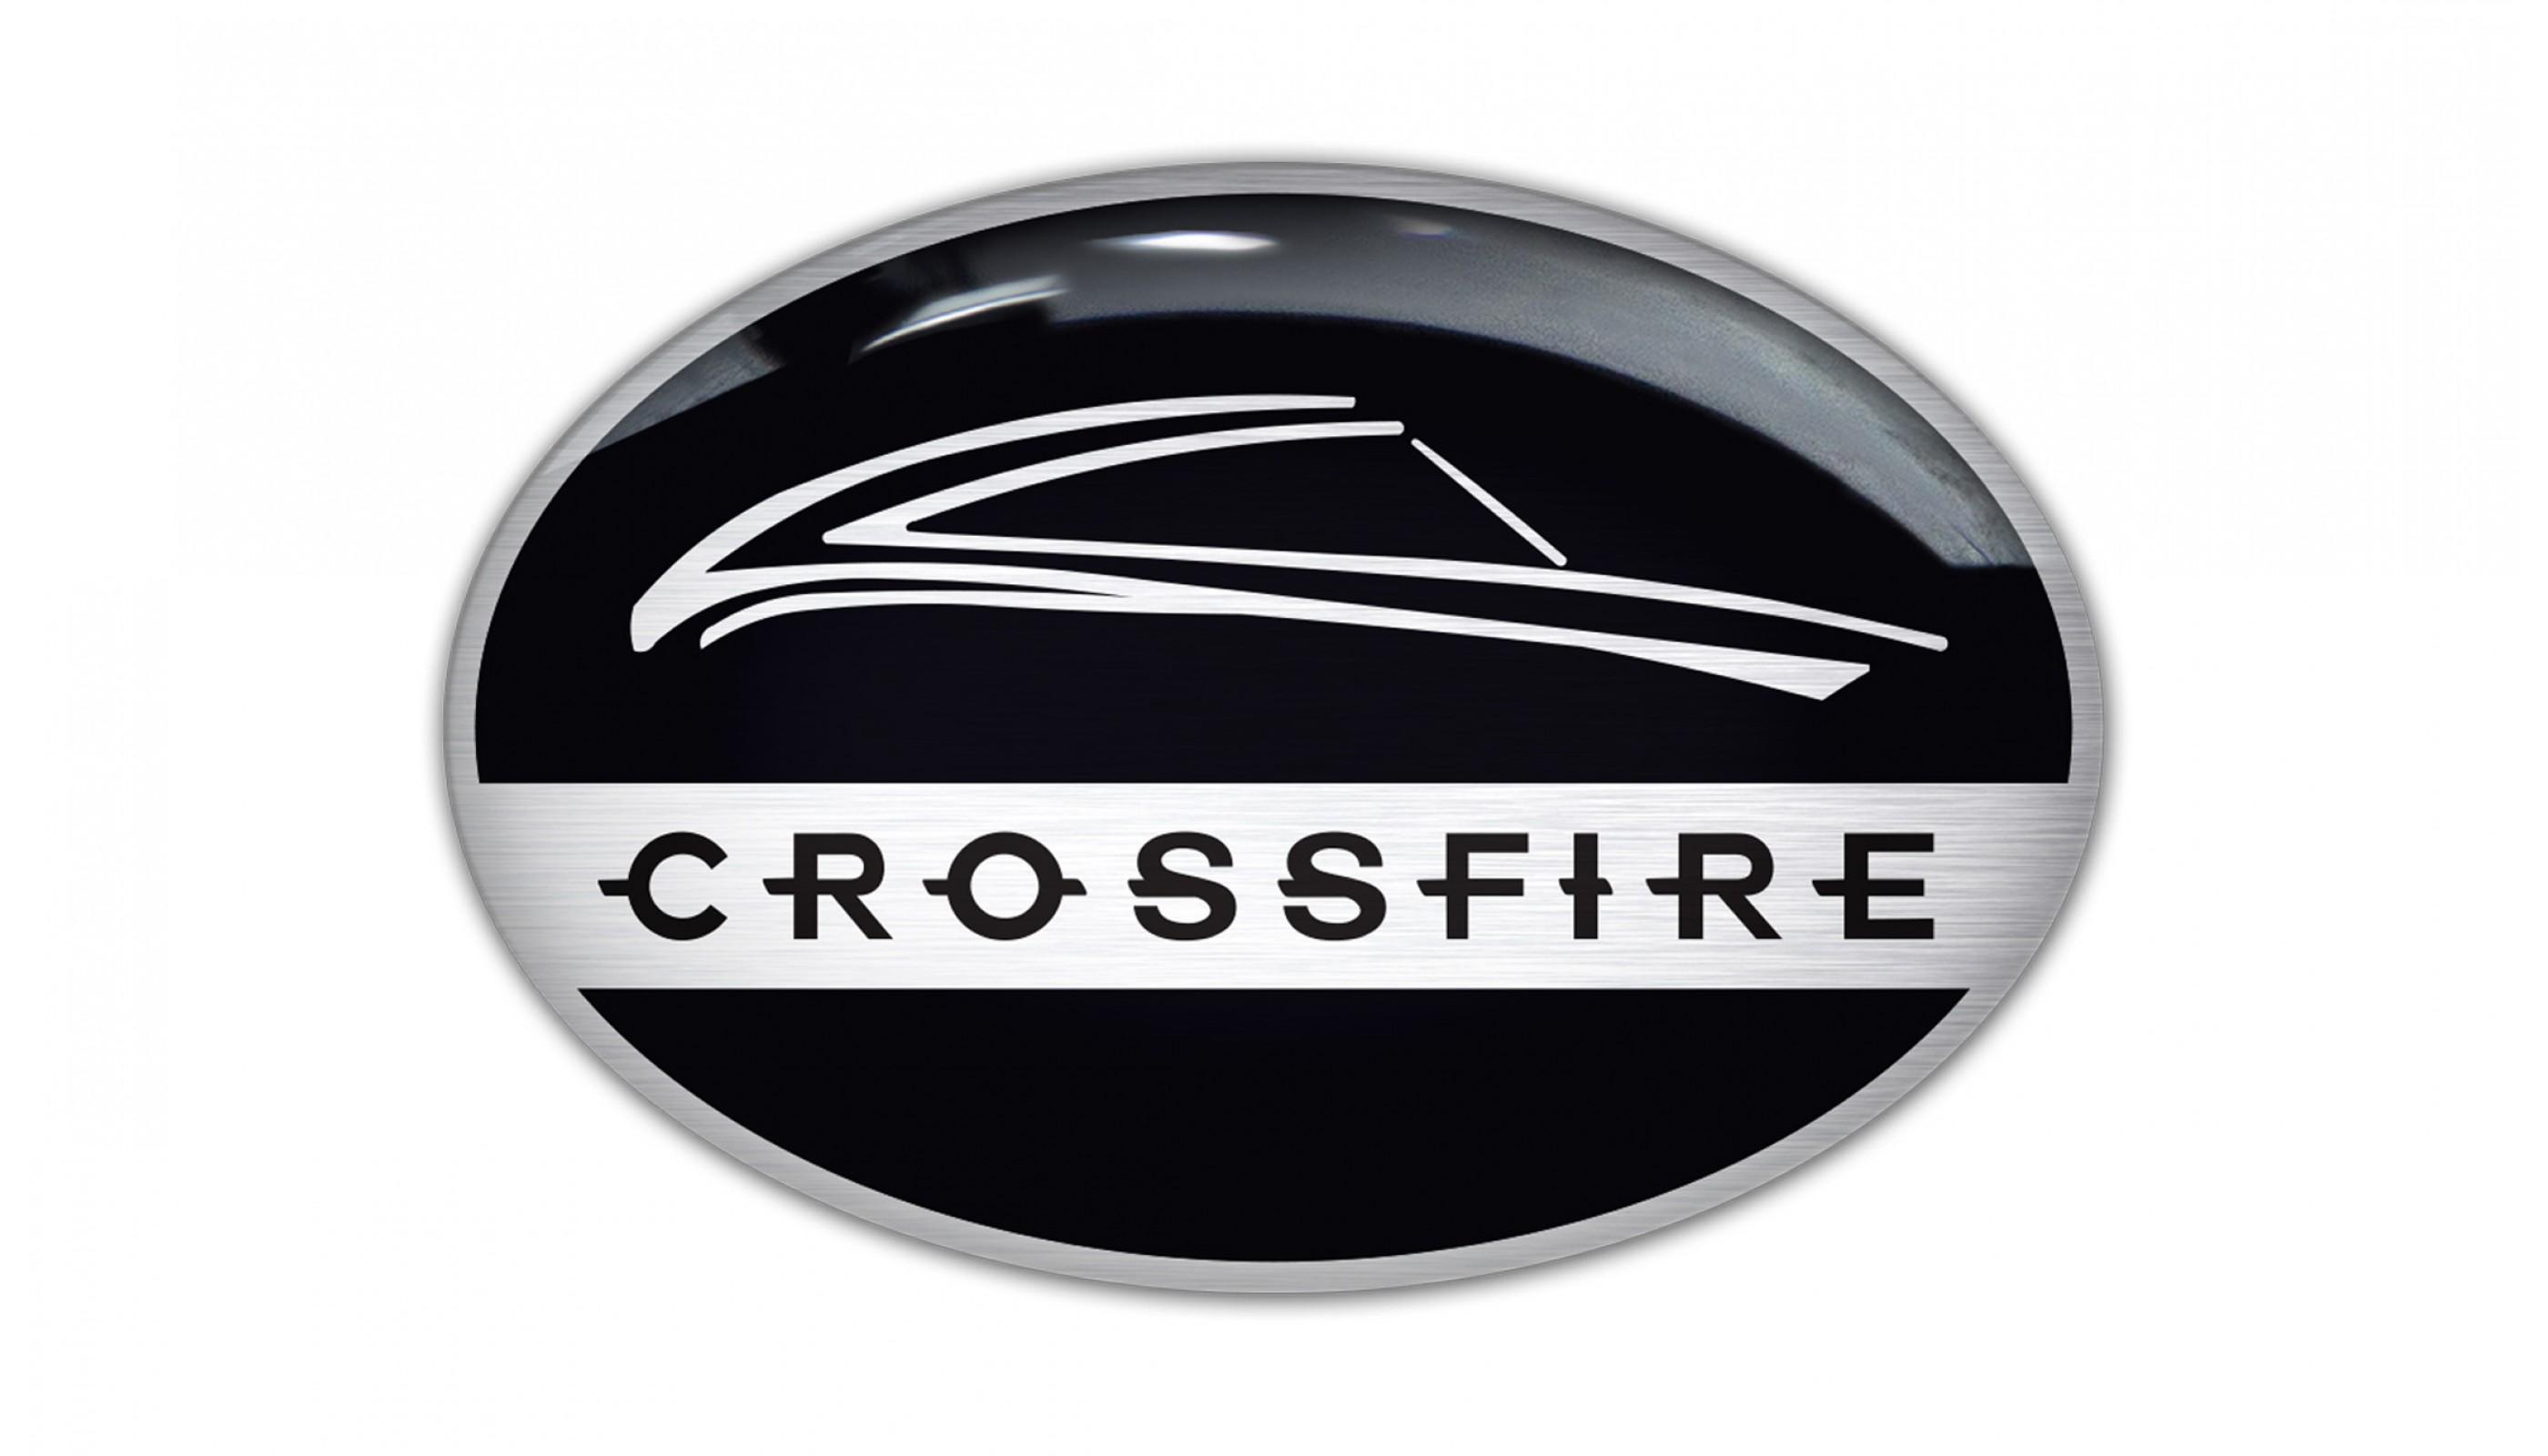 Crossfire Spiderman Steering Wheel Rear Back Emblems